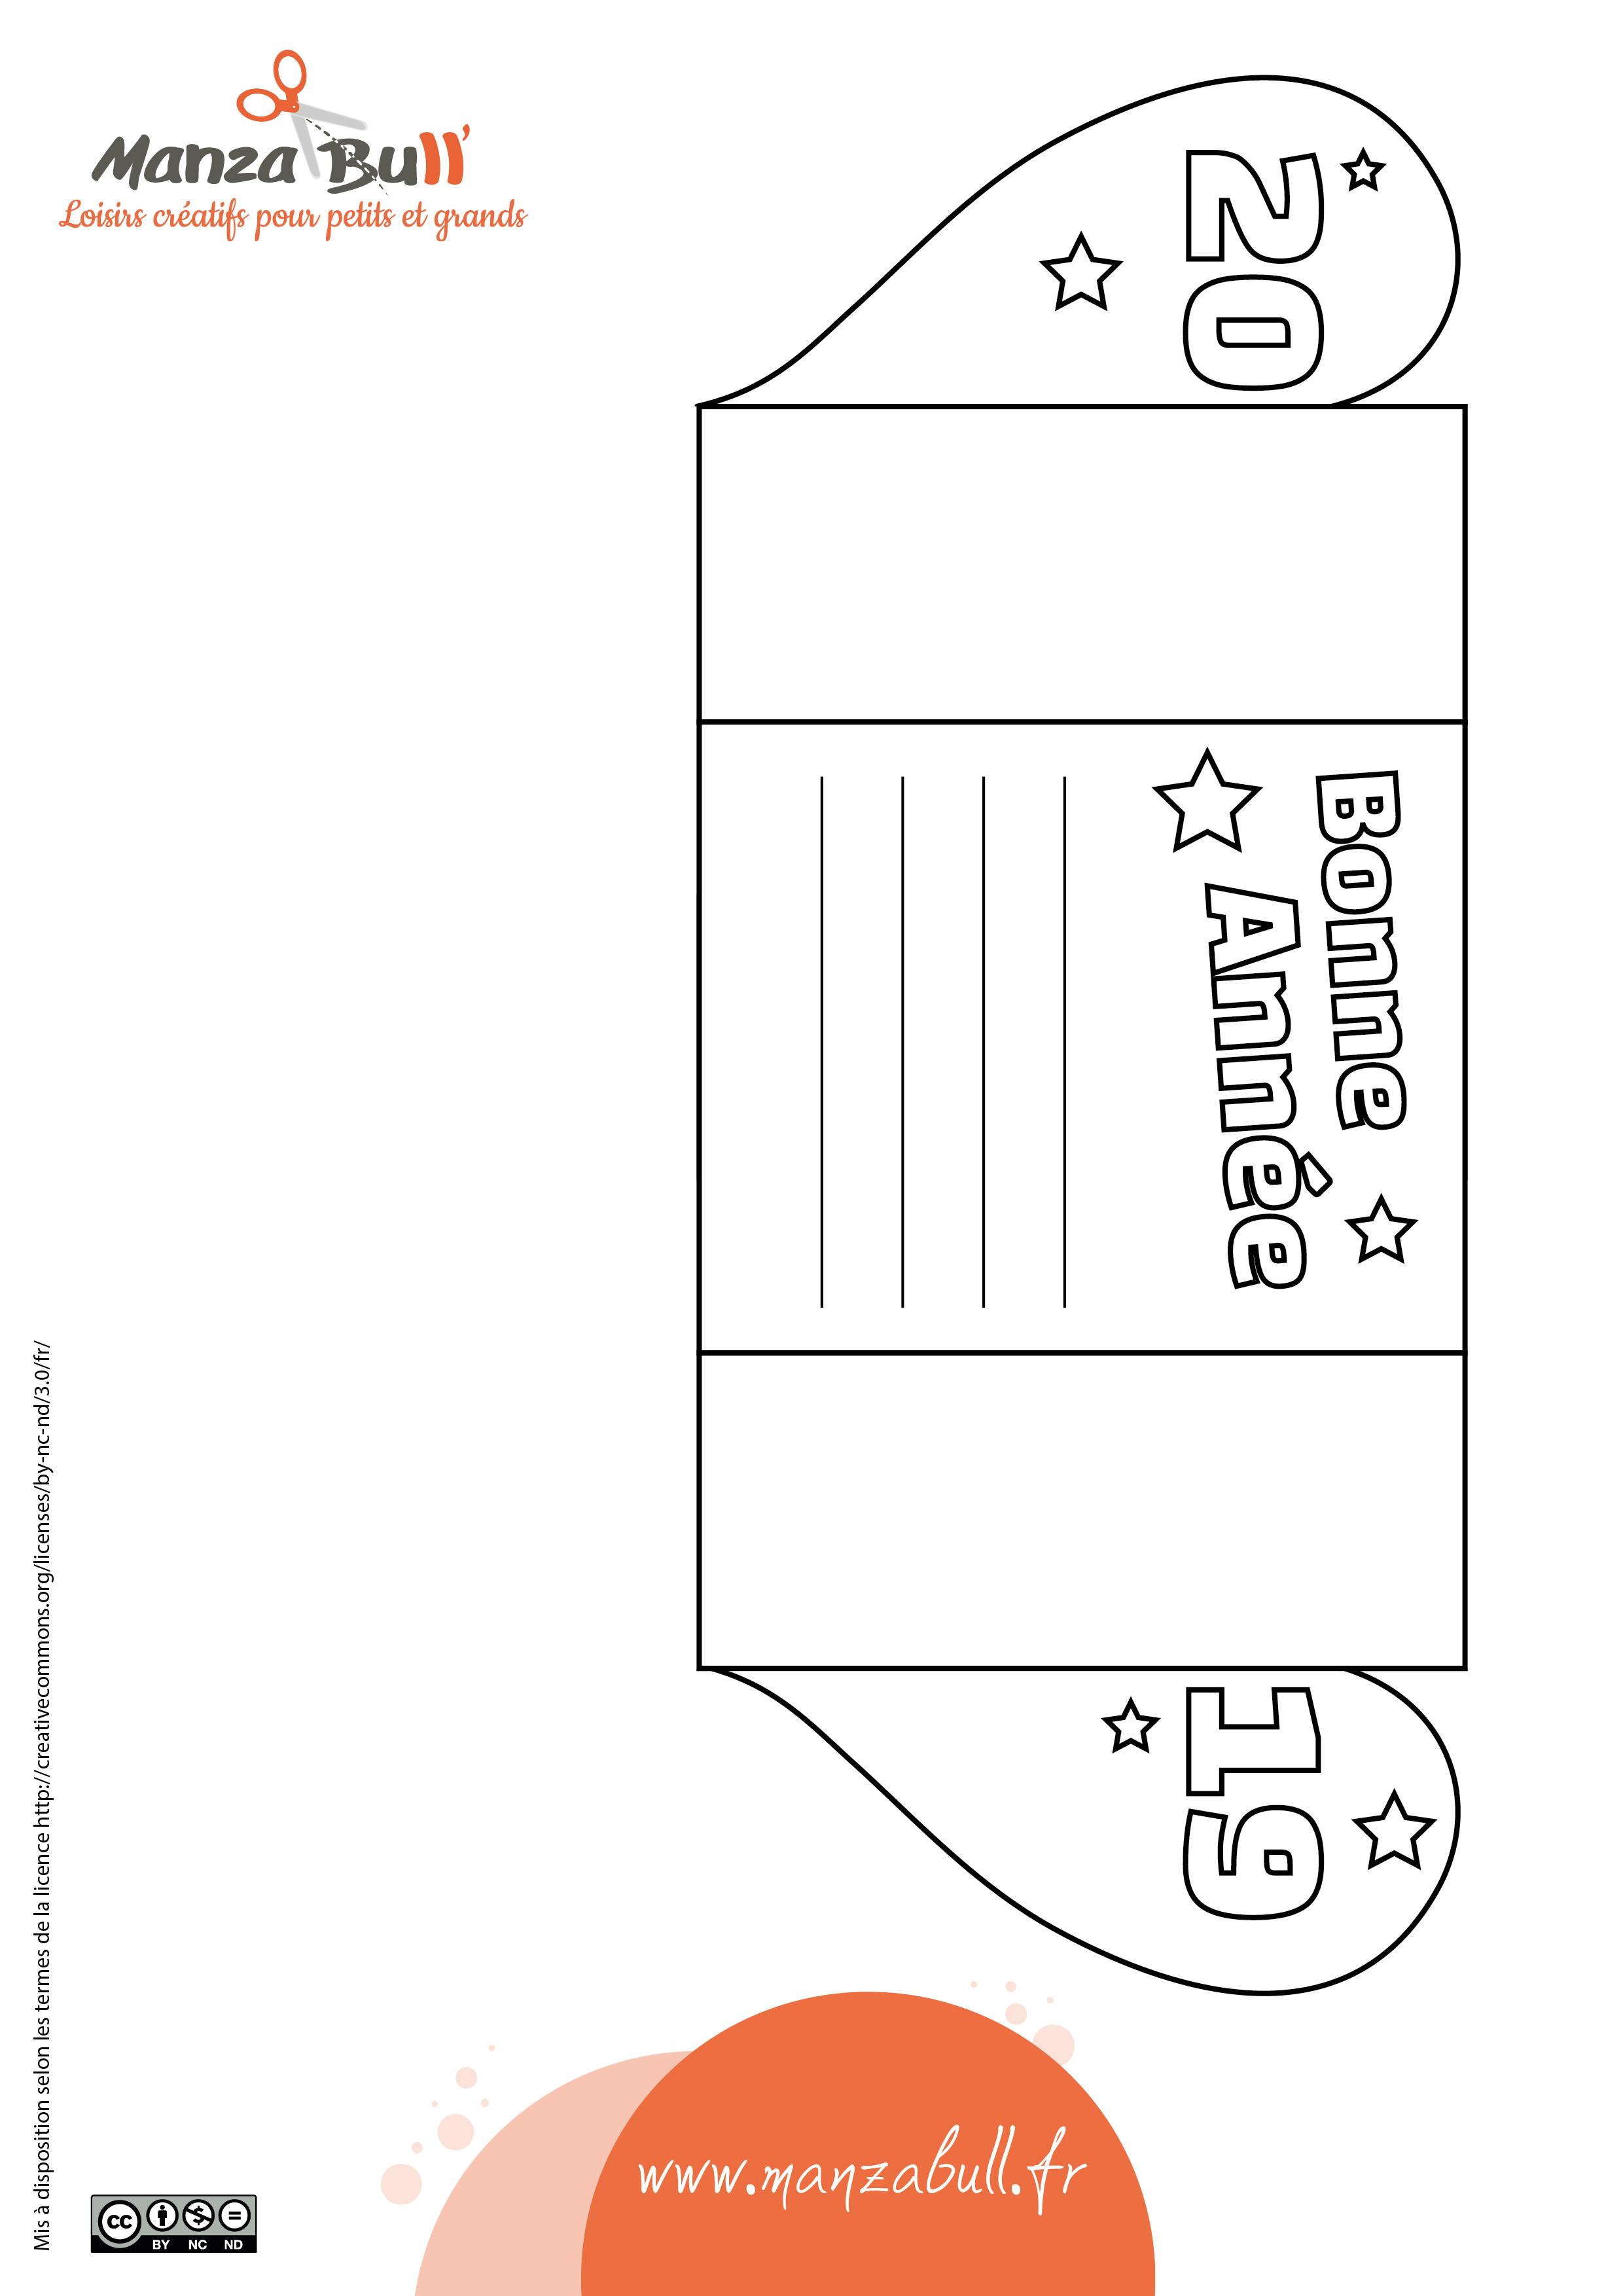 carte de voeux 2019 à imprimer - manzabull'